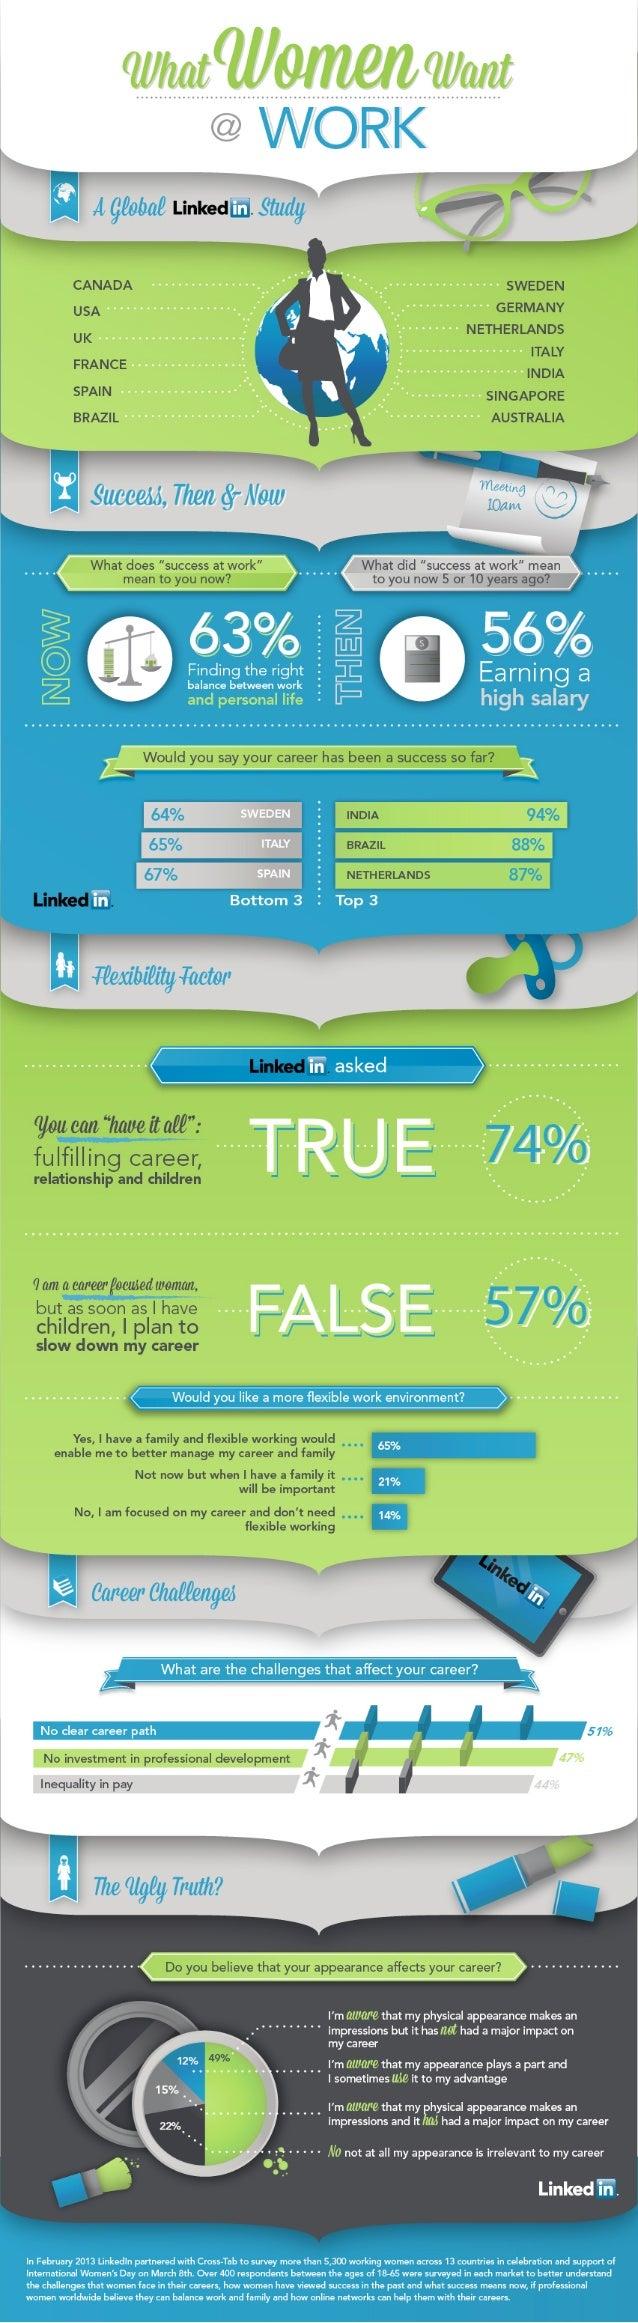 LinkedIn Women @ Work Infographic